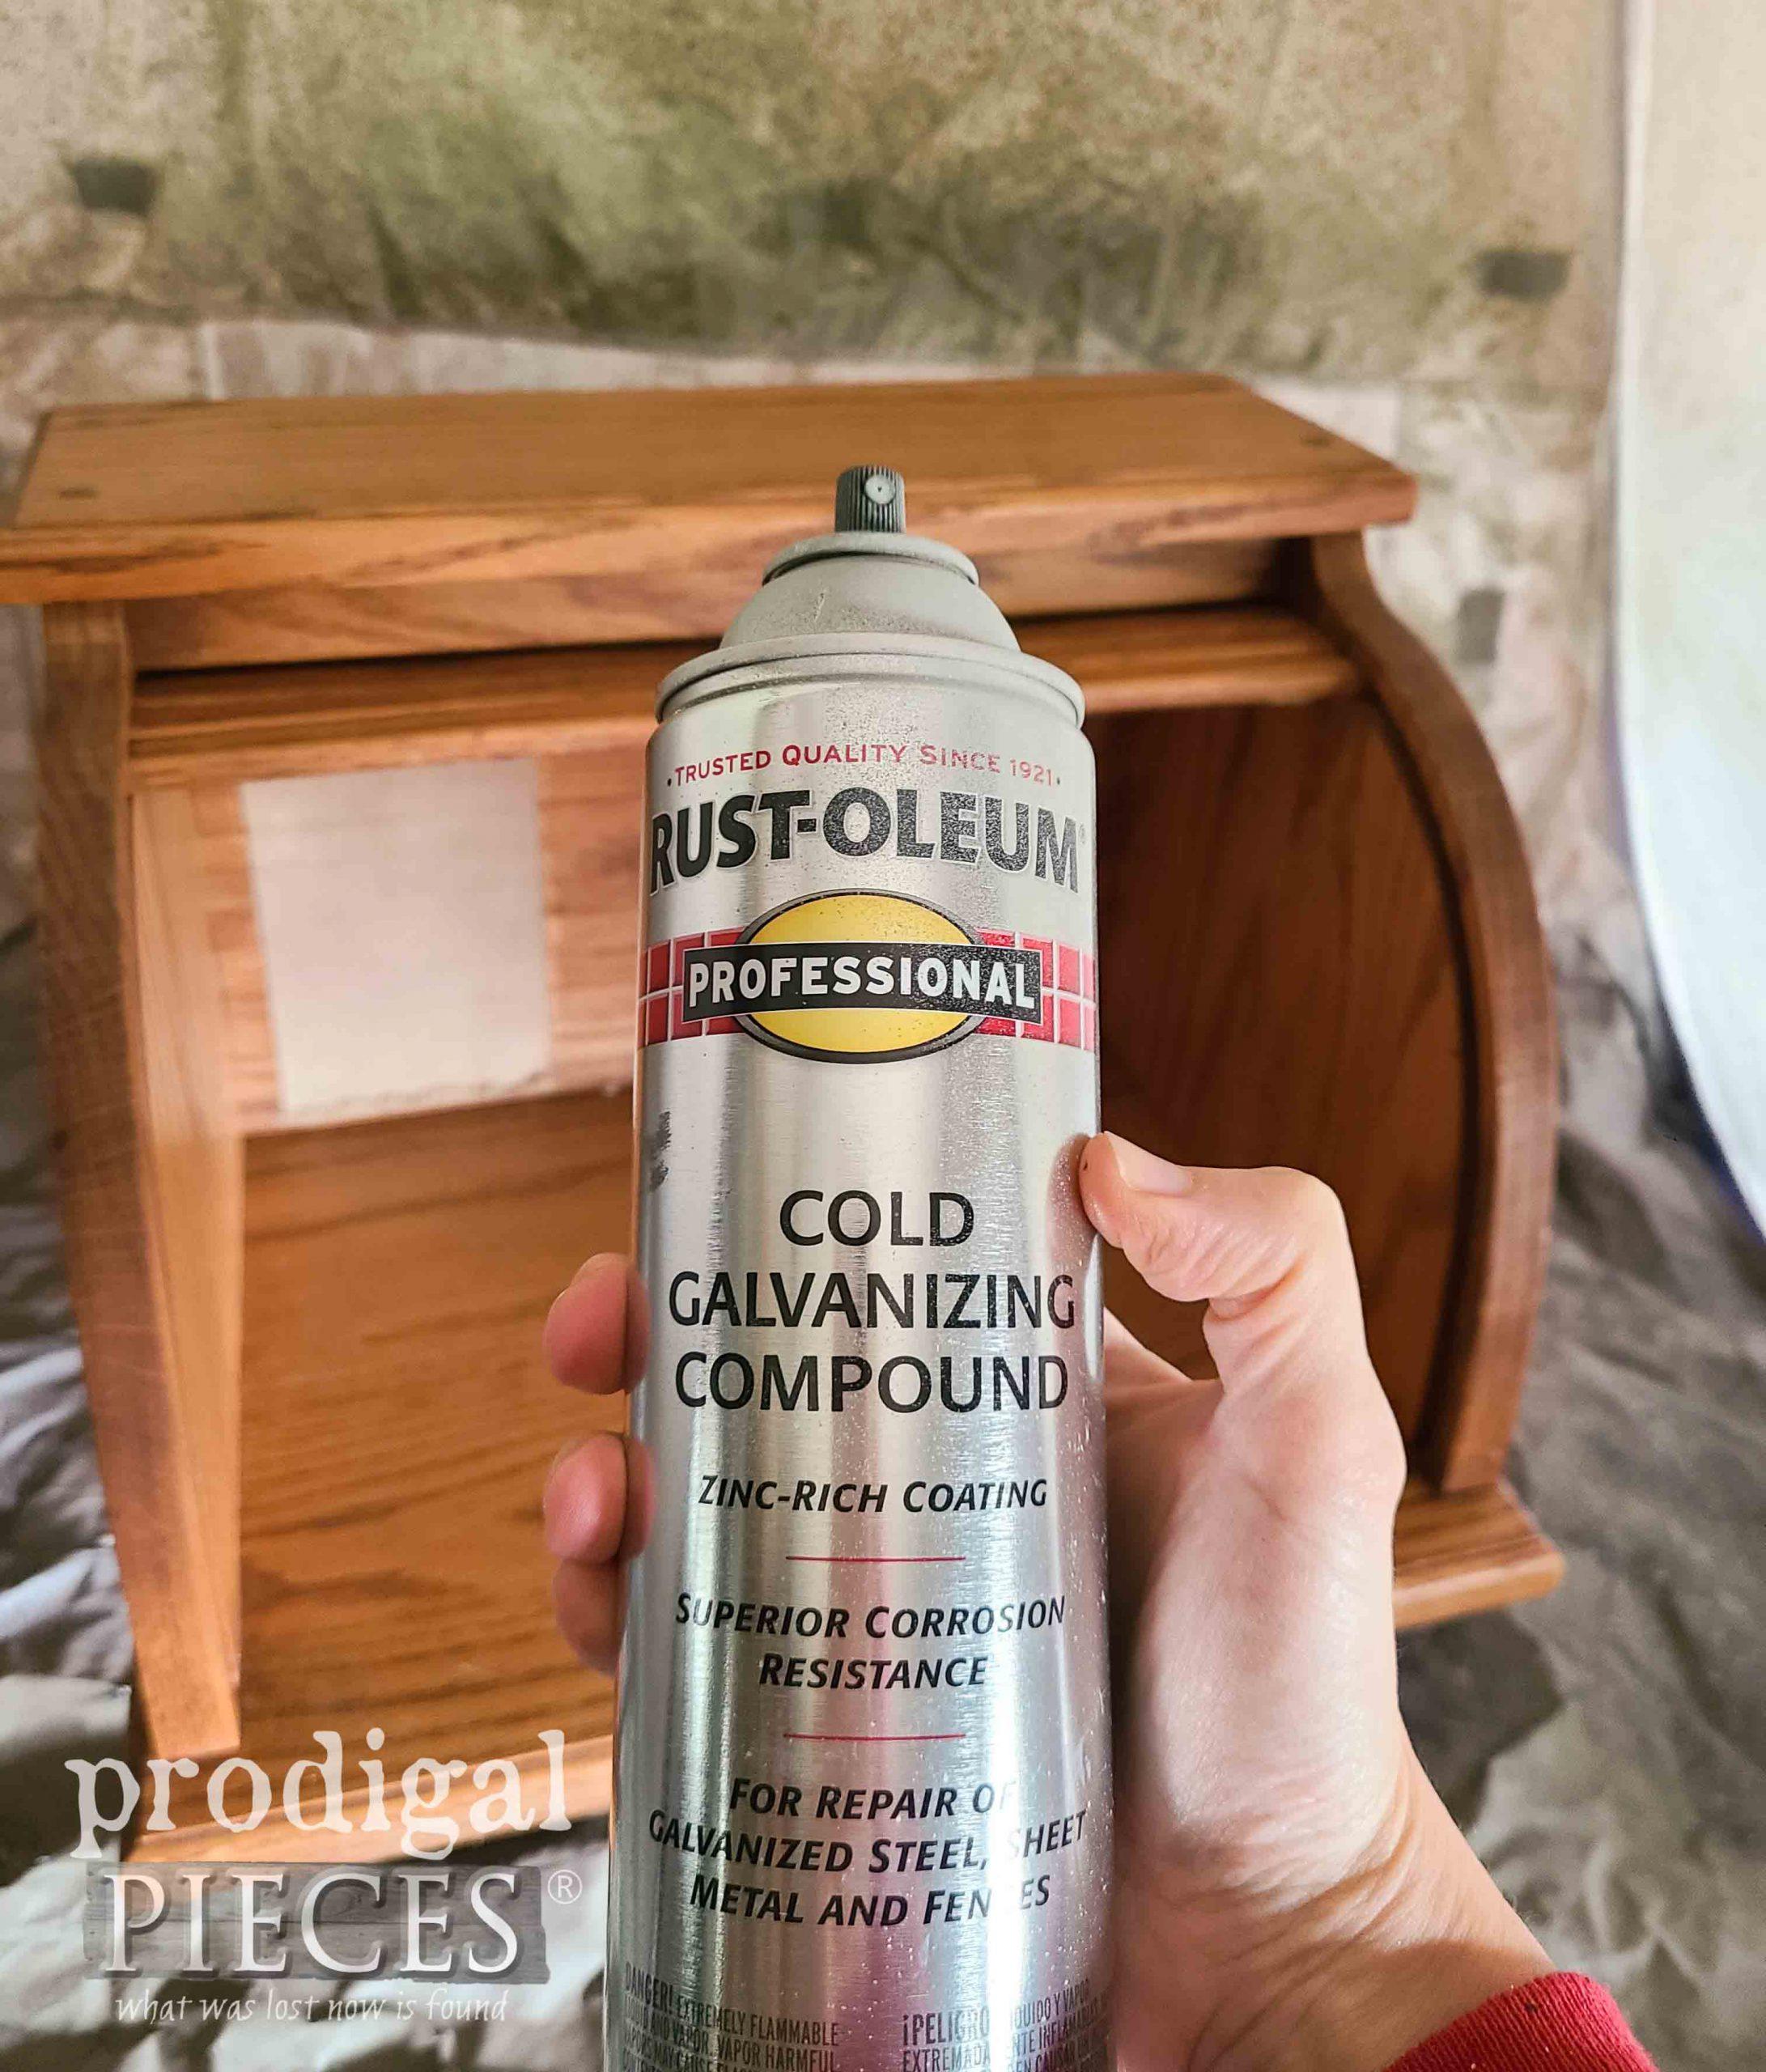 Cold Galvanizing Compound Spray Paint for Faux Zinc Finish by Prodigal Pieces | prodigalpieces.com